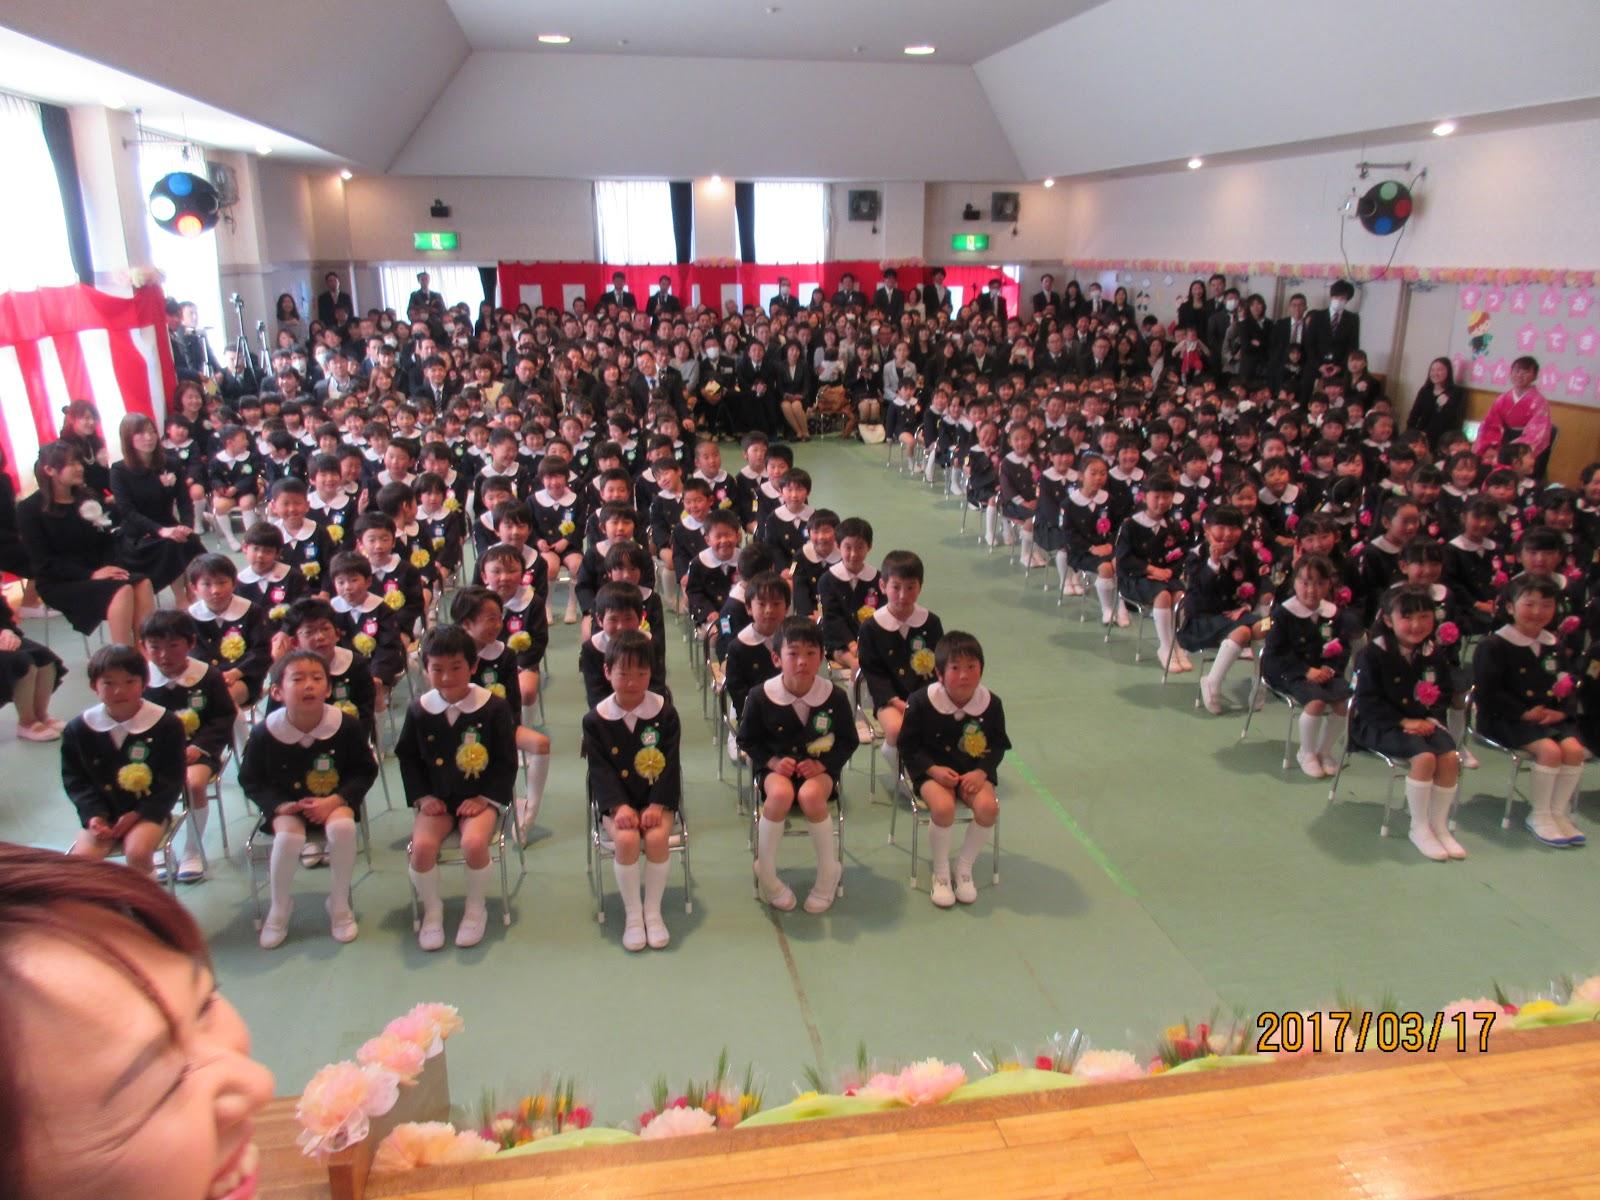 English new and used: Kindergarten graduation